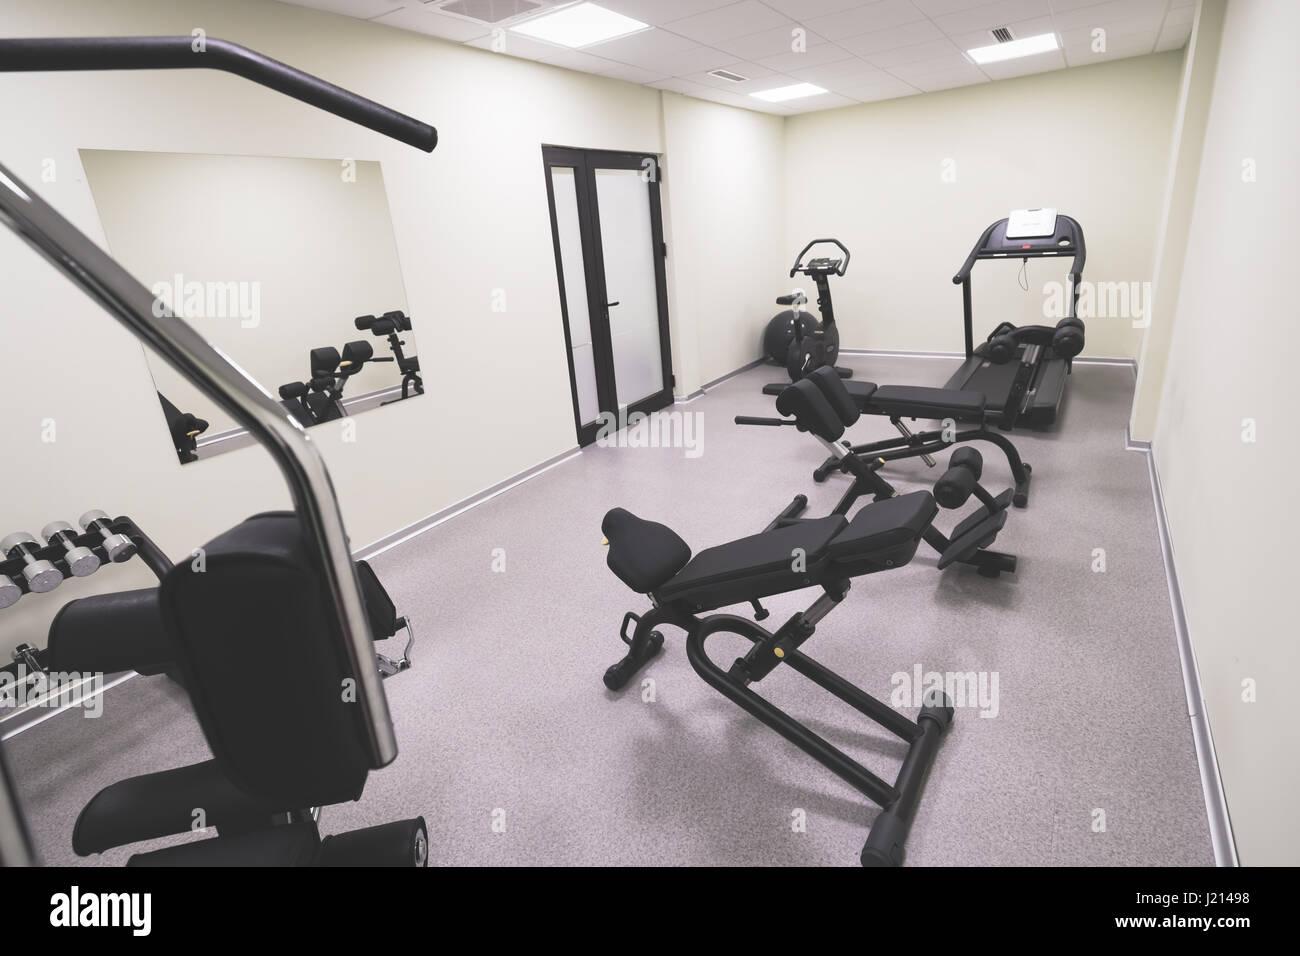 Luxury gym immagini luxury gym fotos stock alamy - Piccola palestra in casa ...